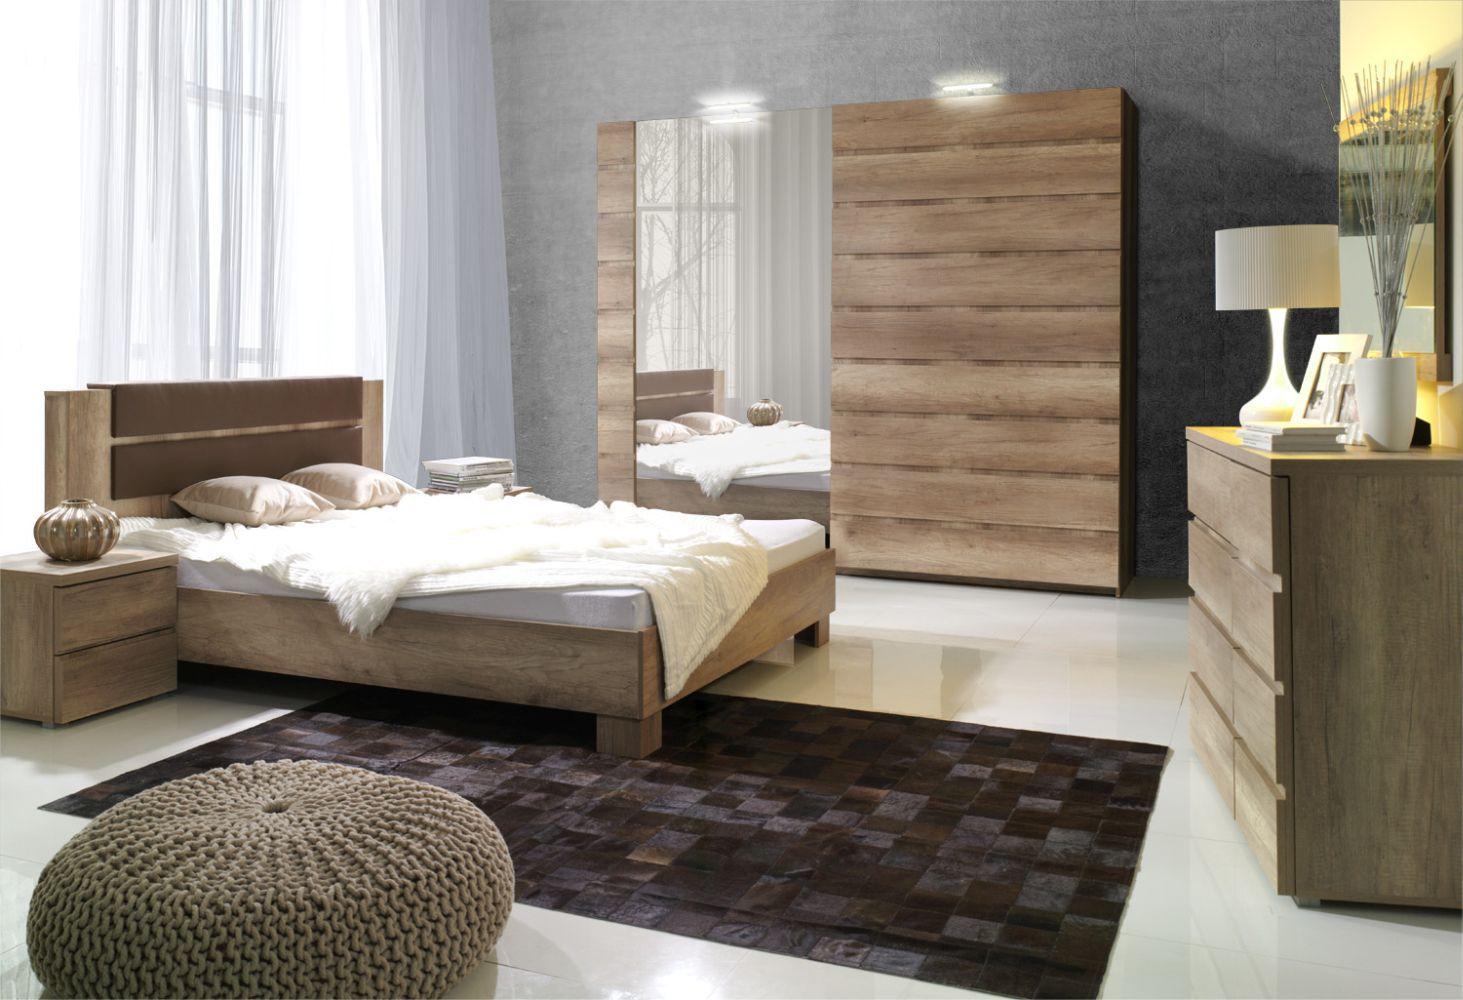 Schlafzimmer Komplett - Set E Nestorio, 6-teilig, Farbe: Eiche